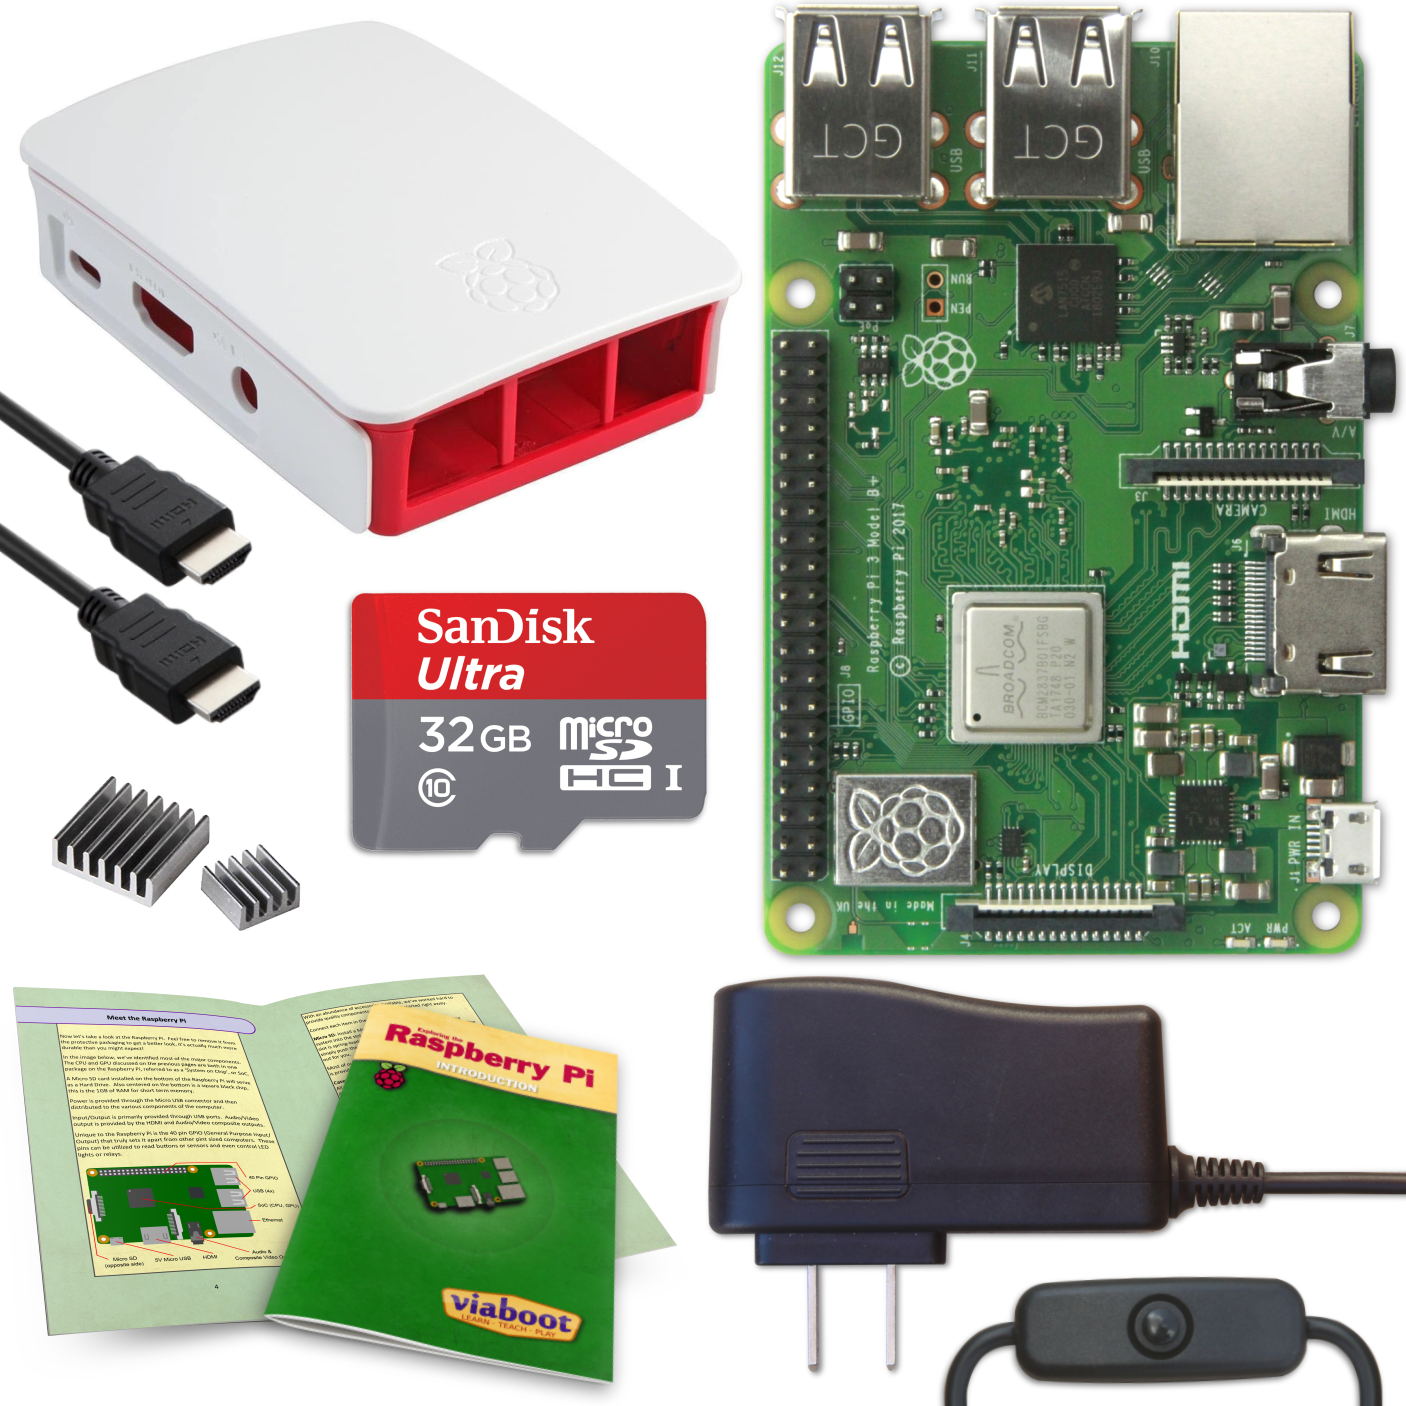 Viaboot Raspberry Pi 3 B+ Complete Kit with Premium Black Case